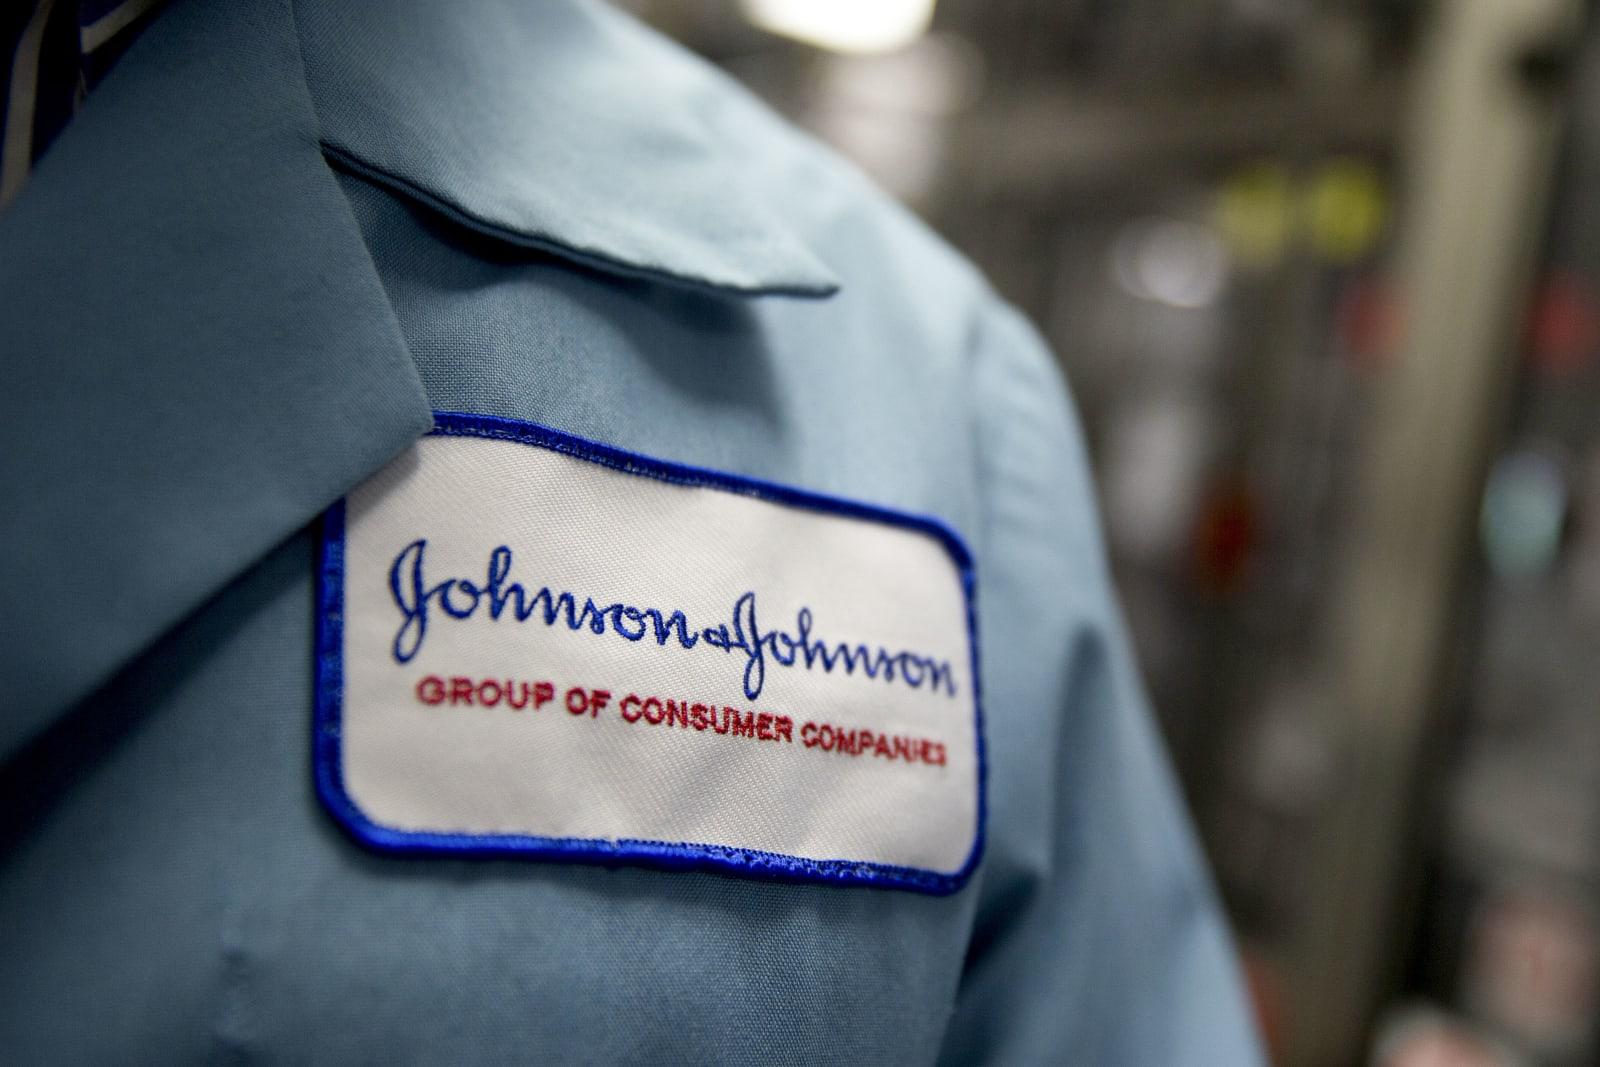 Why is Johnson & Johnson getting into startups? - Wadhwani Foundation